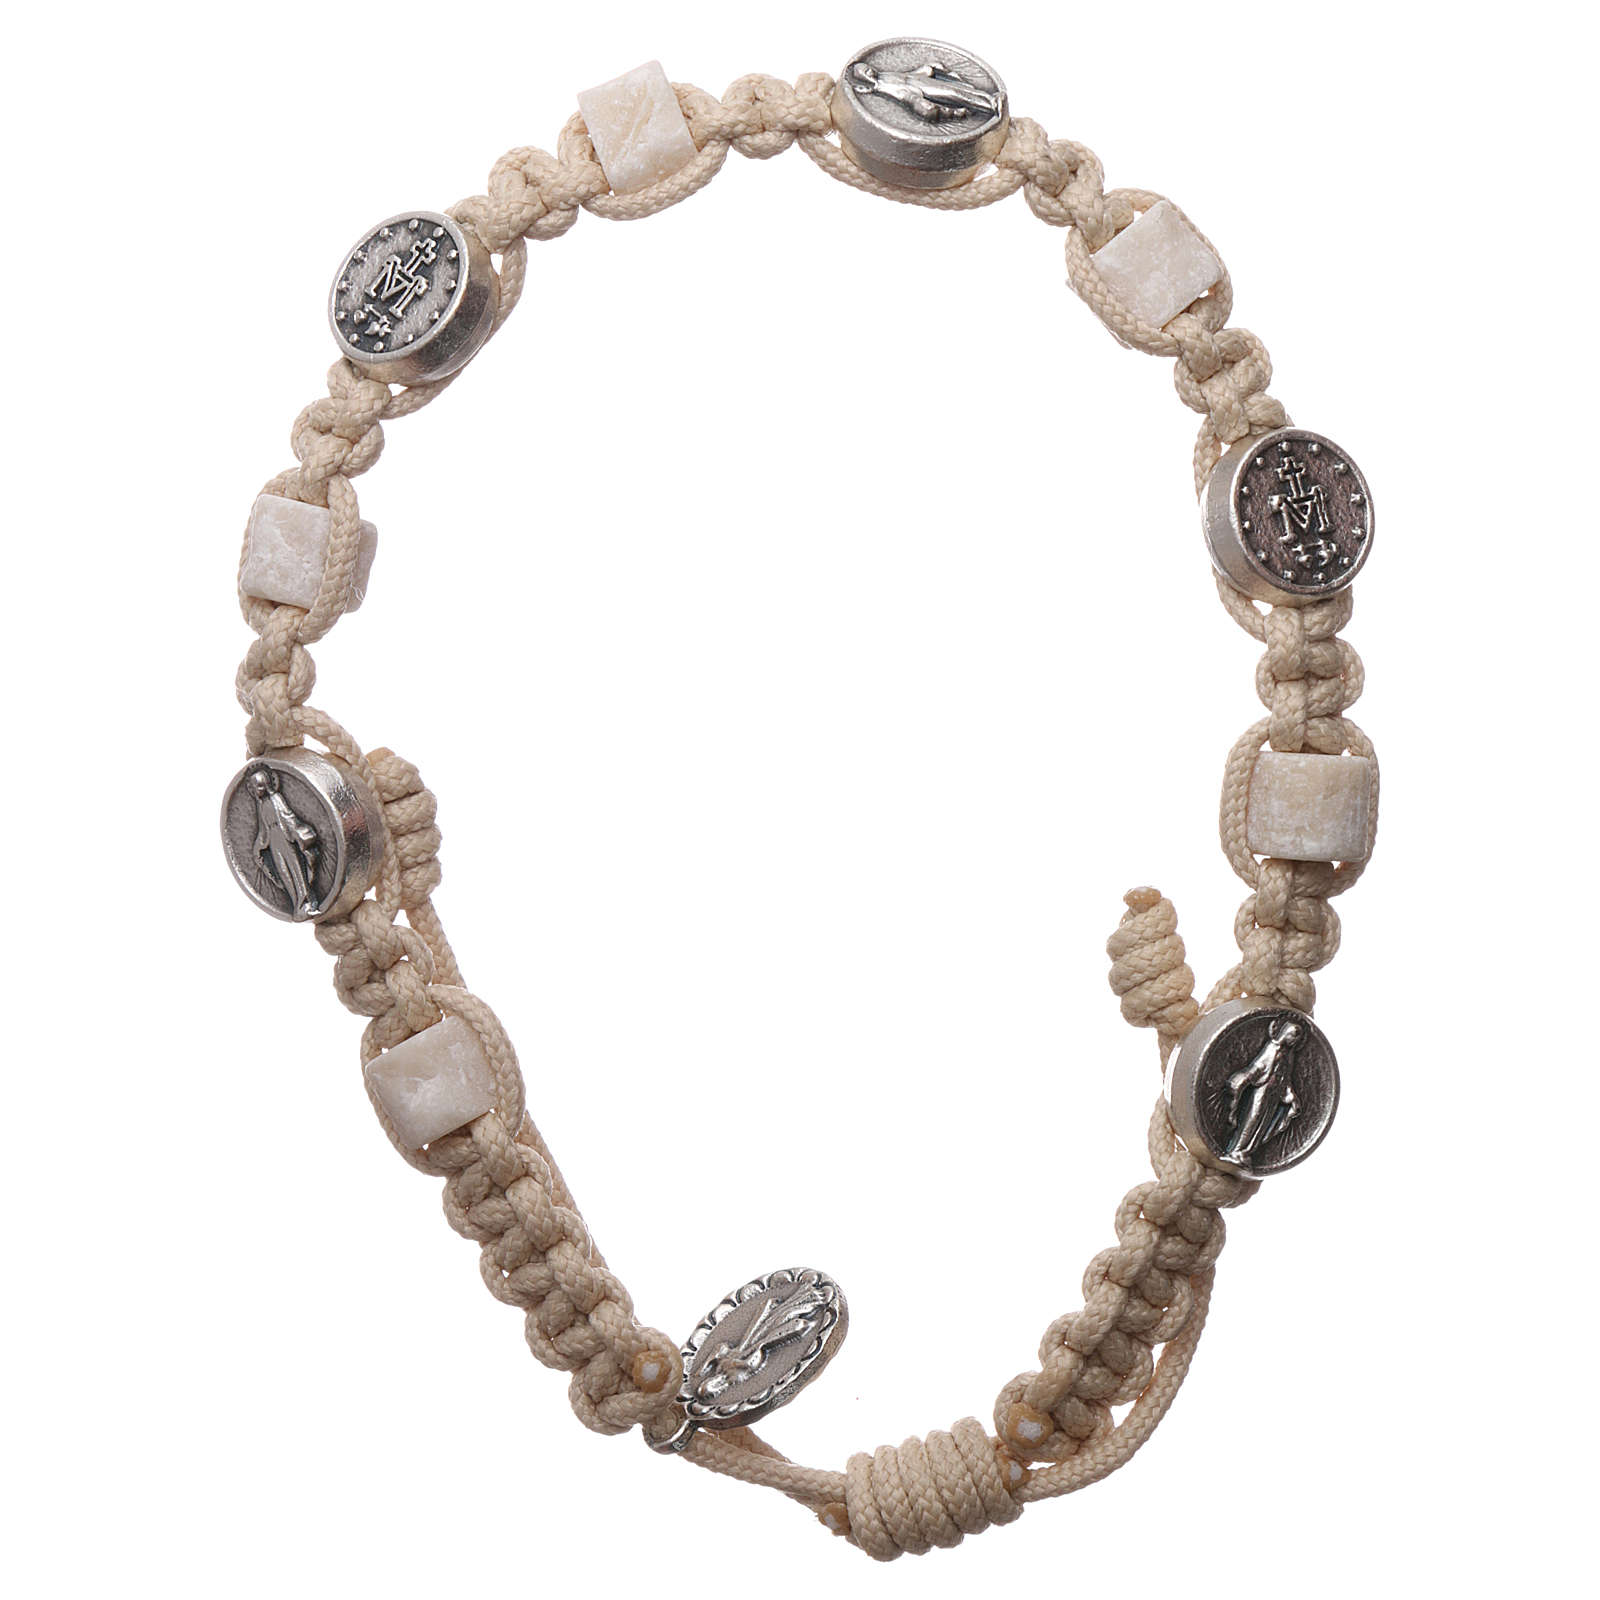 Medjugorje bracelet, cord, medal, stone 4